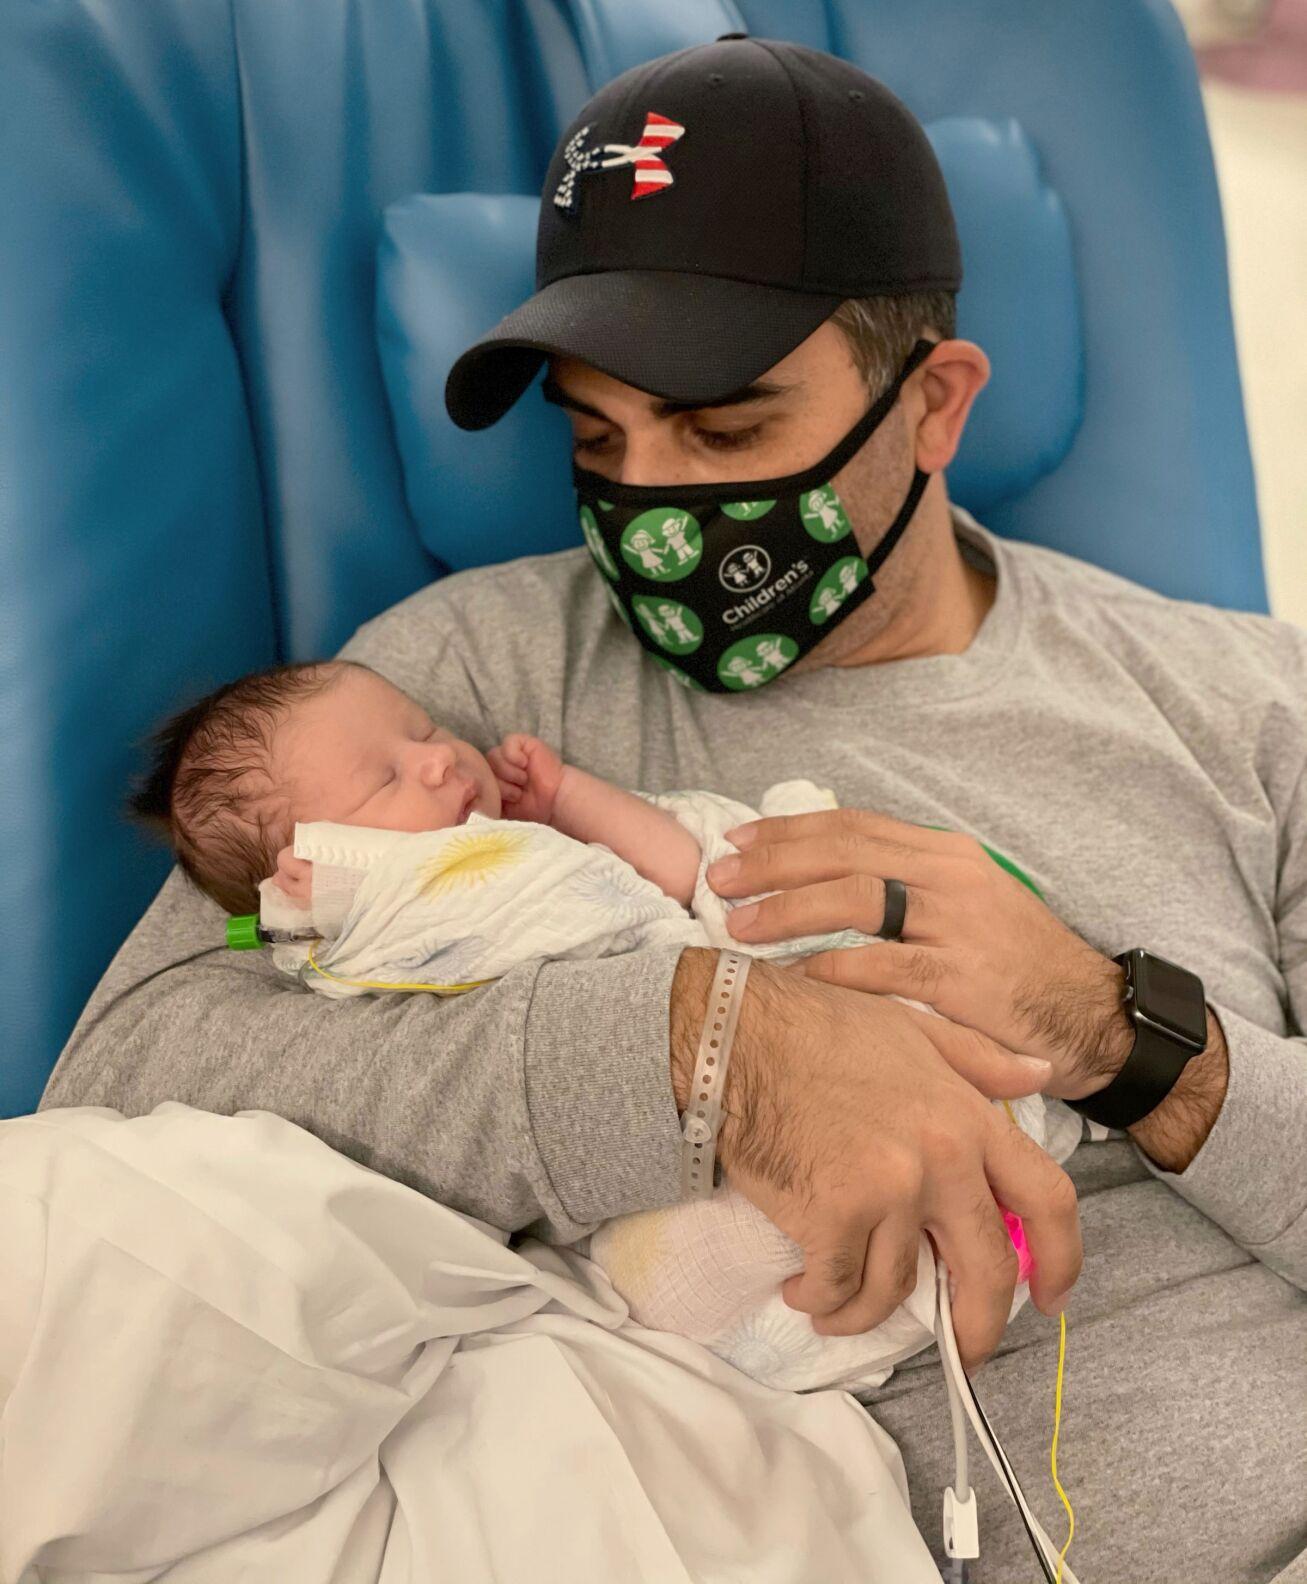 063021_MNS_baby_Caroline_002 Jeff Lakdawala with daughter